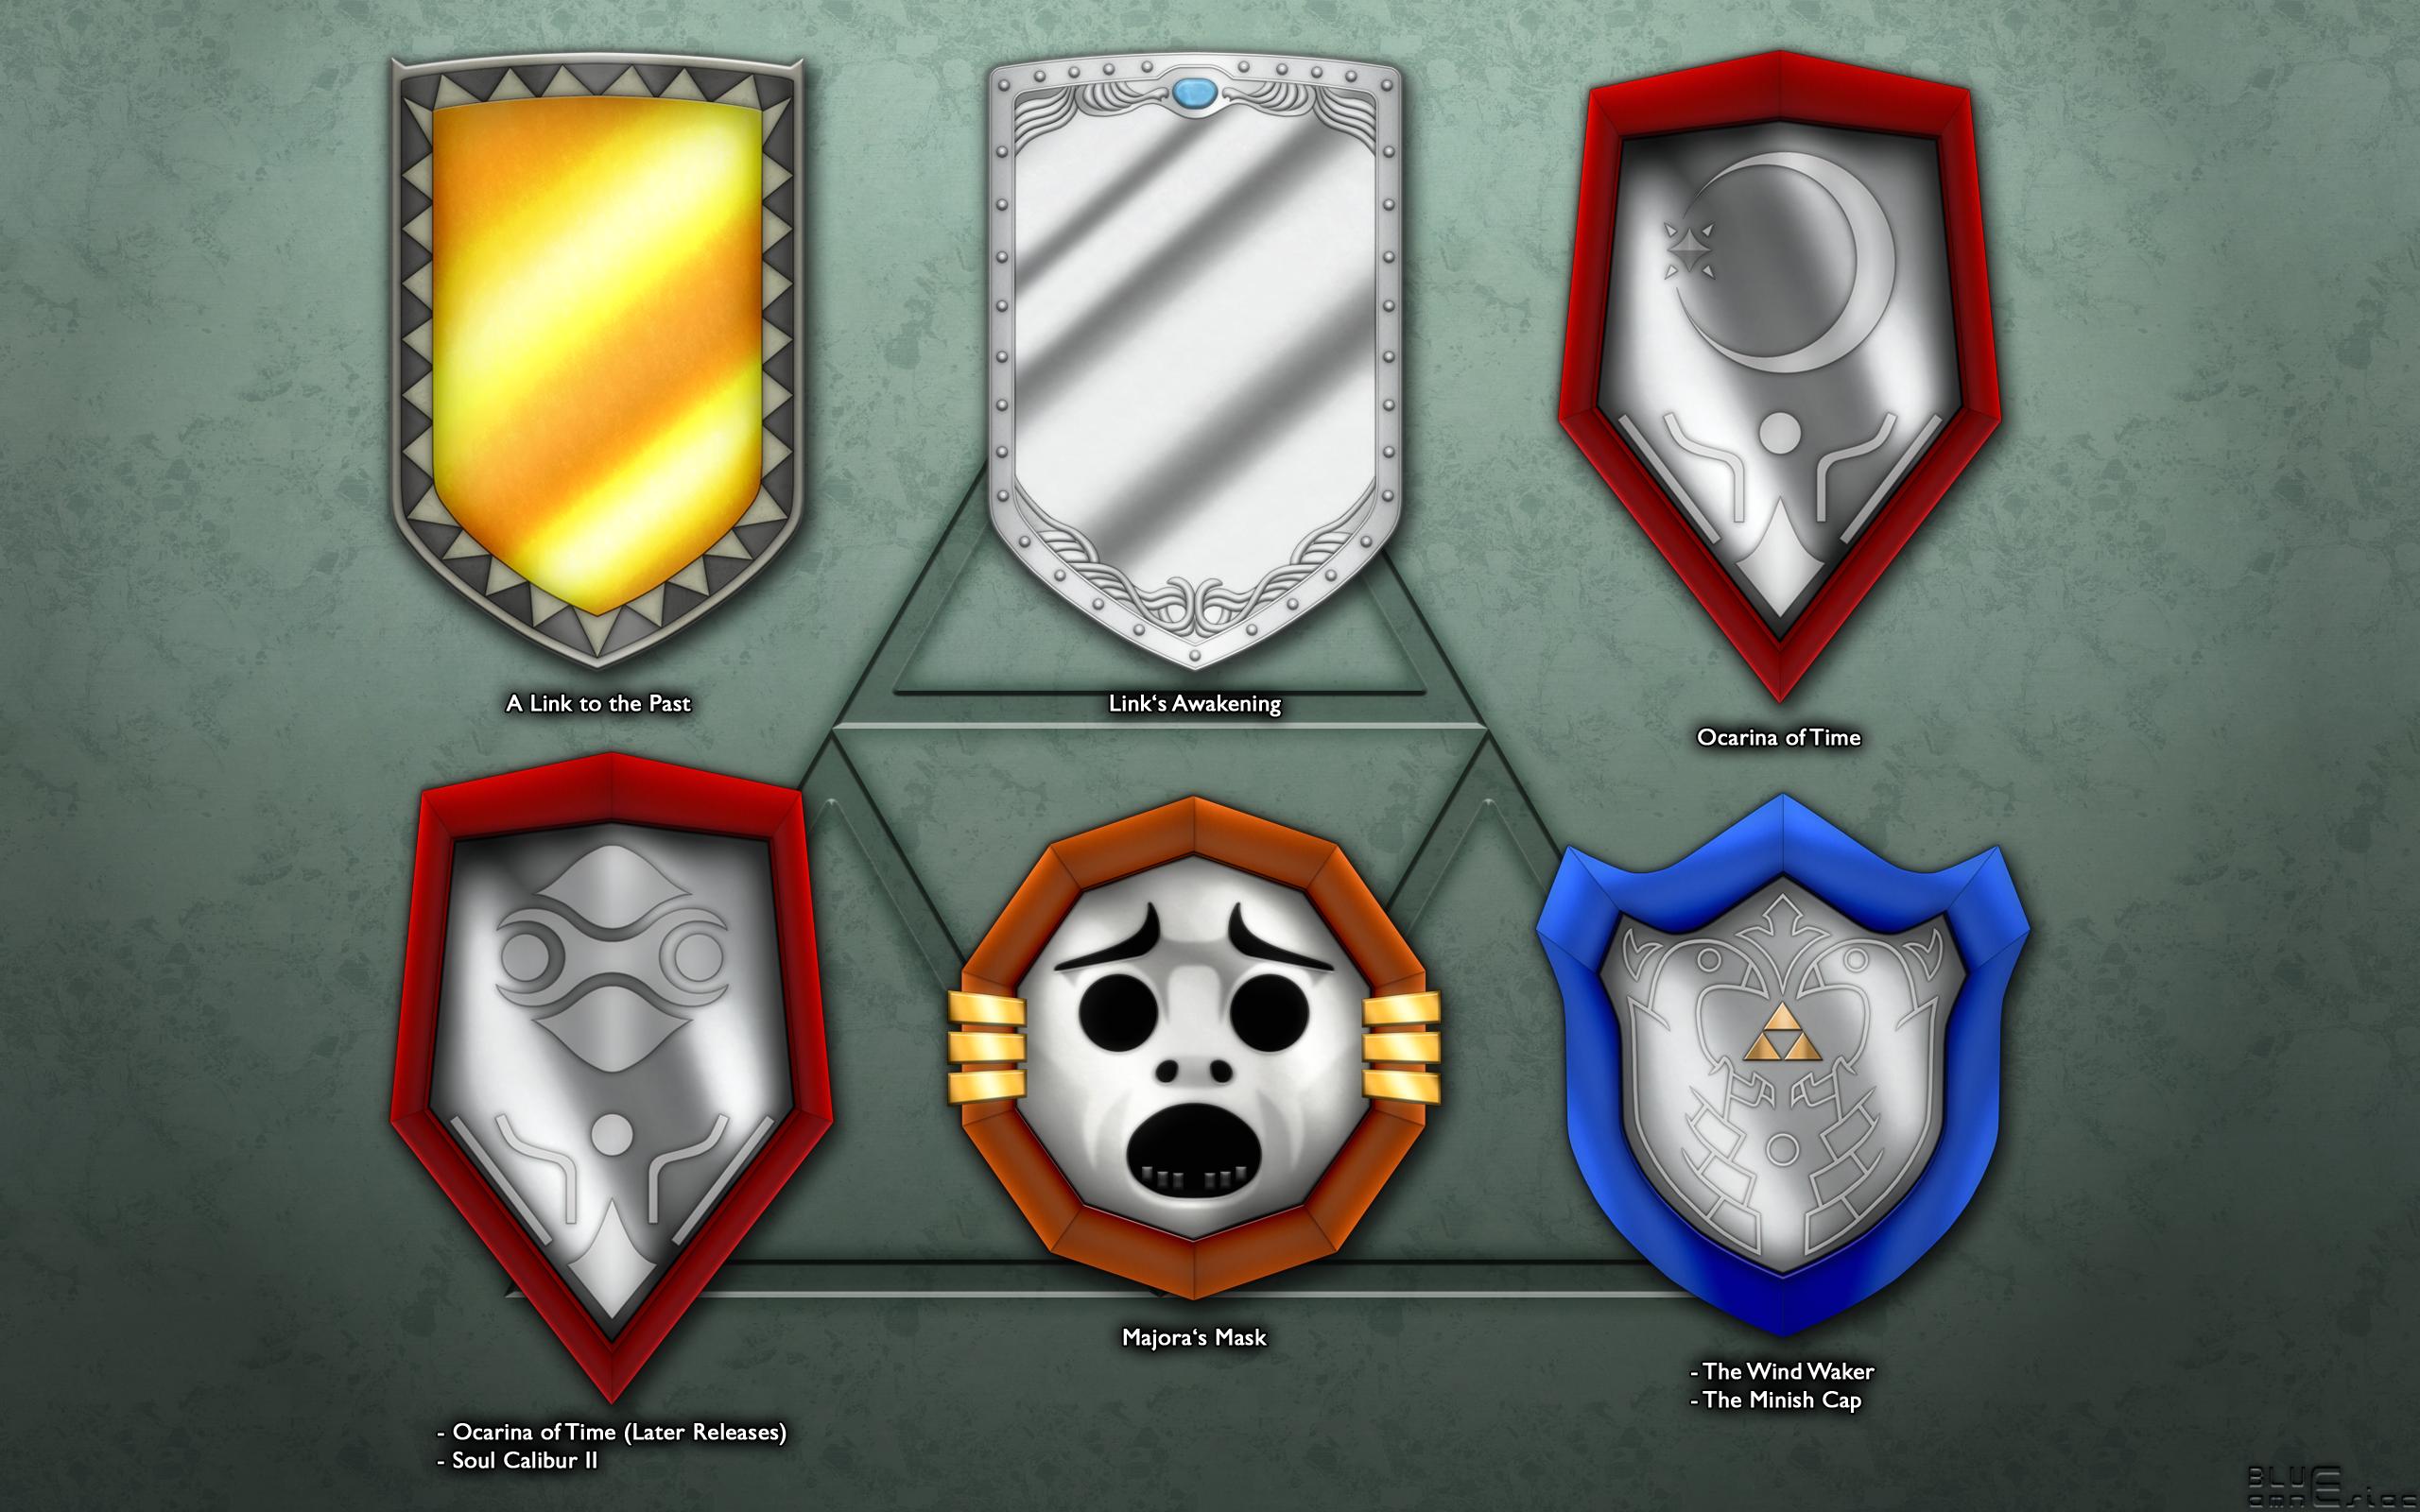 Evolution Of Links Mirror Shield The Legend Of Zelda Know Your Meme